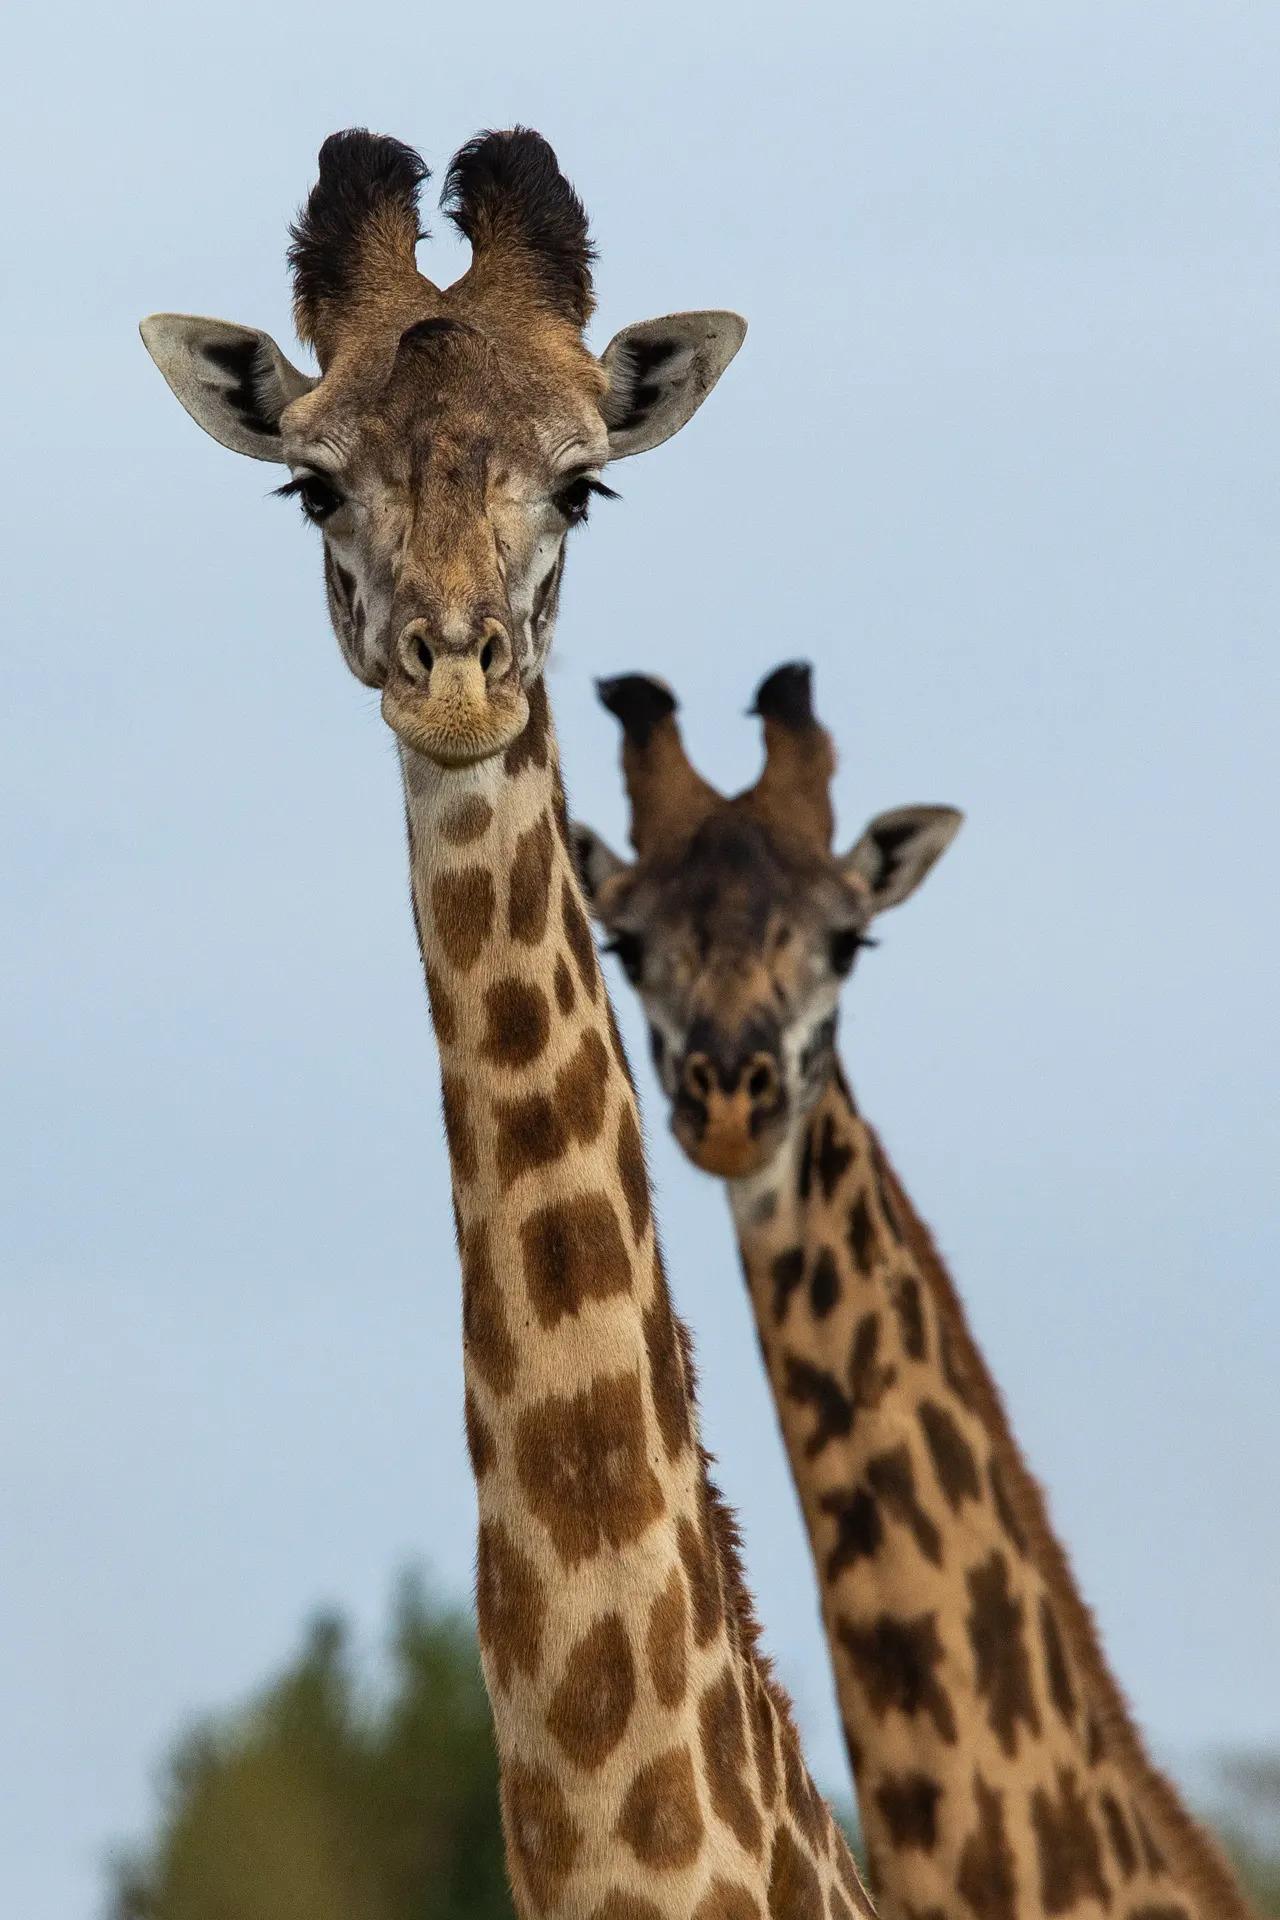 Giraffe 2 necks